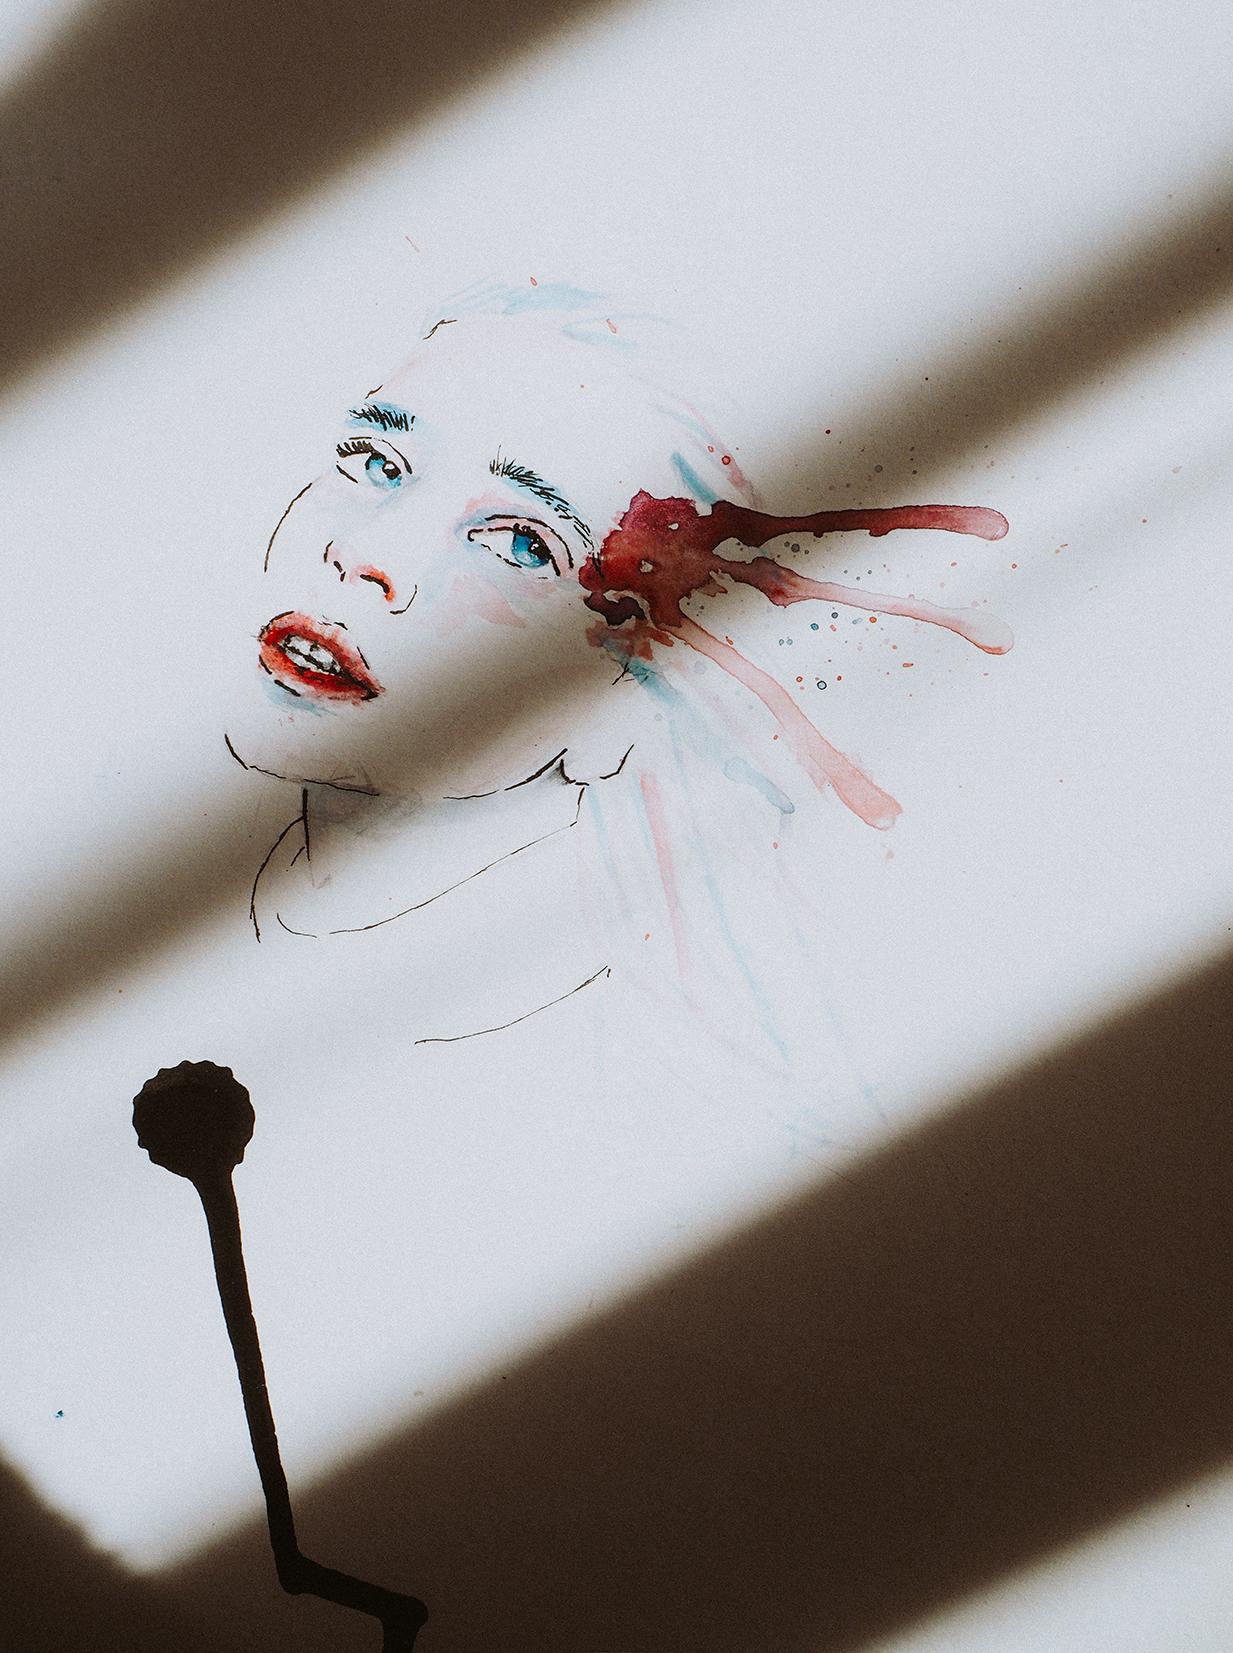 Artwork by Michael Colborne